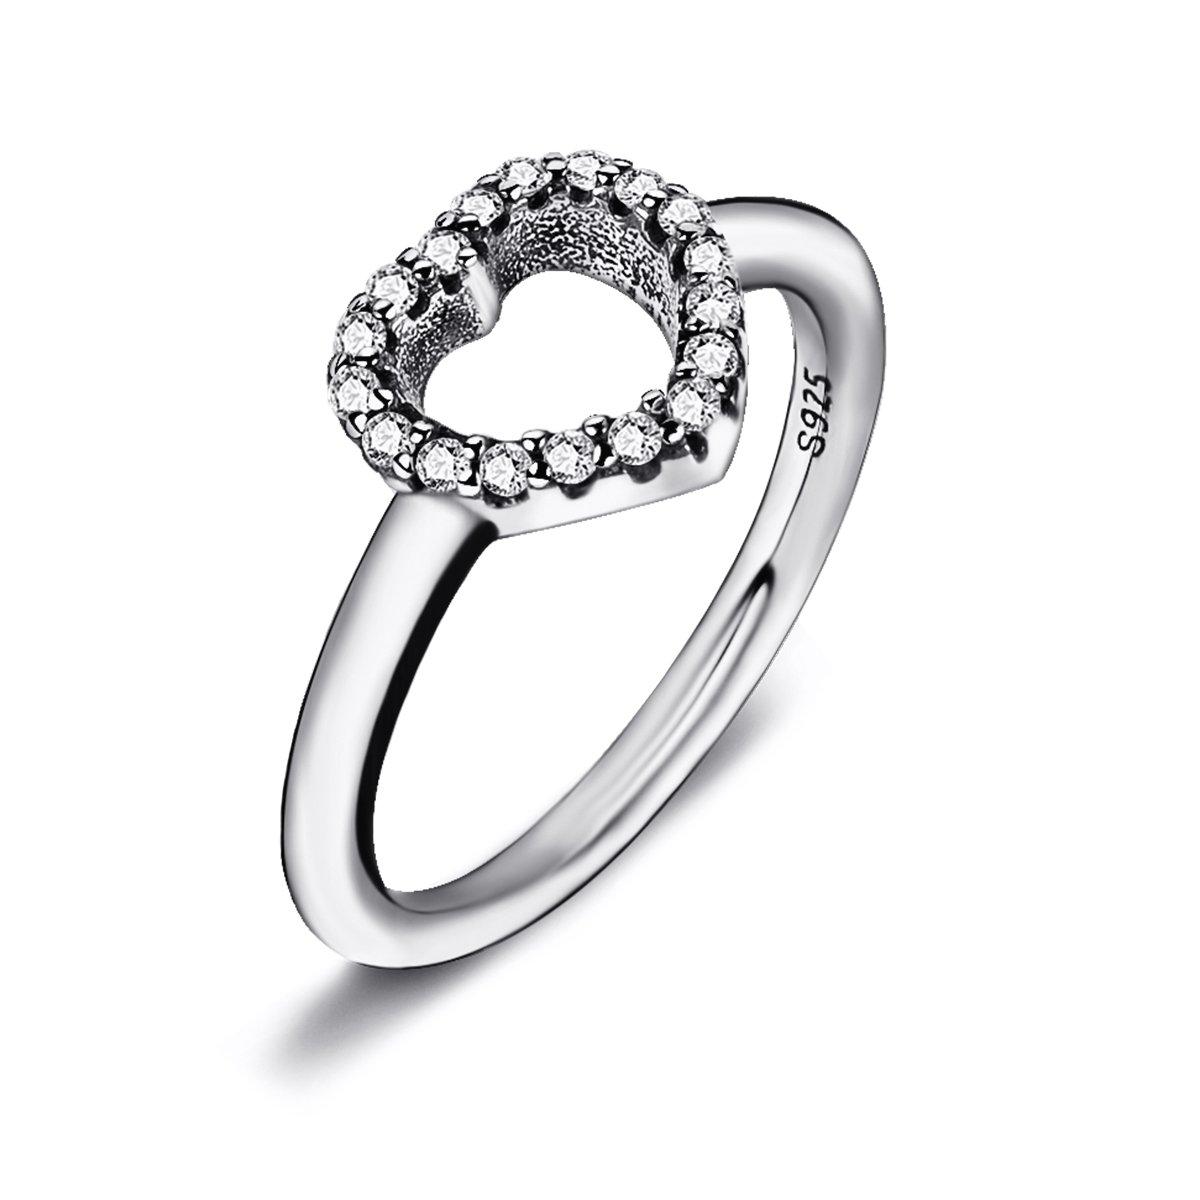 venti Plus be My Valentine argento promessa anello cuore con zirconia cubica trasparente Twenty Plus Twenty Plus ring 024